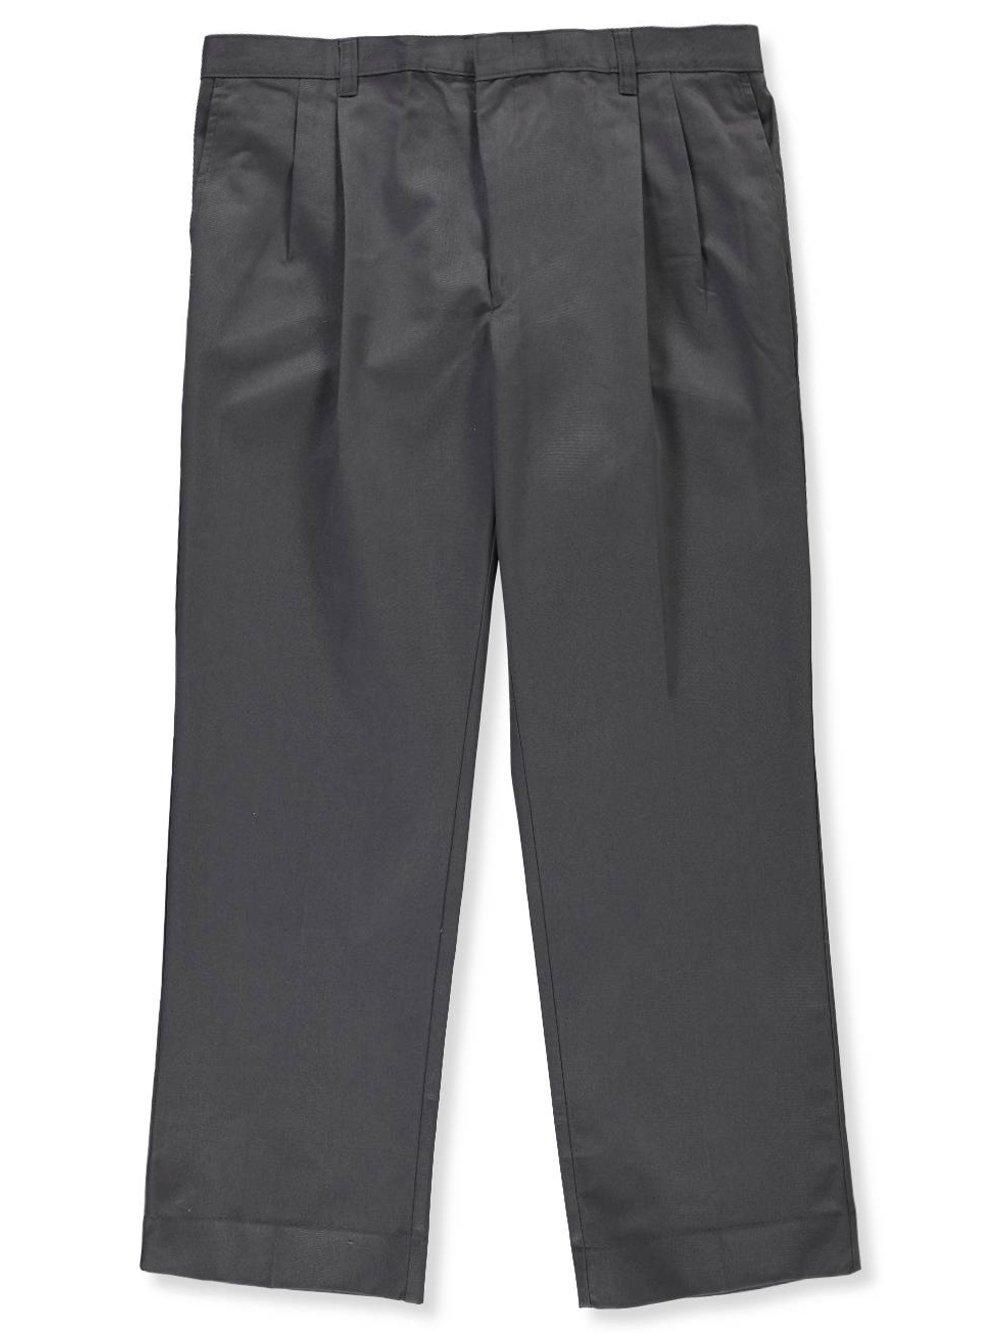 Cookie's Brand Boys' Husky Pleated Pants - Gray, 42 Husky